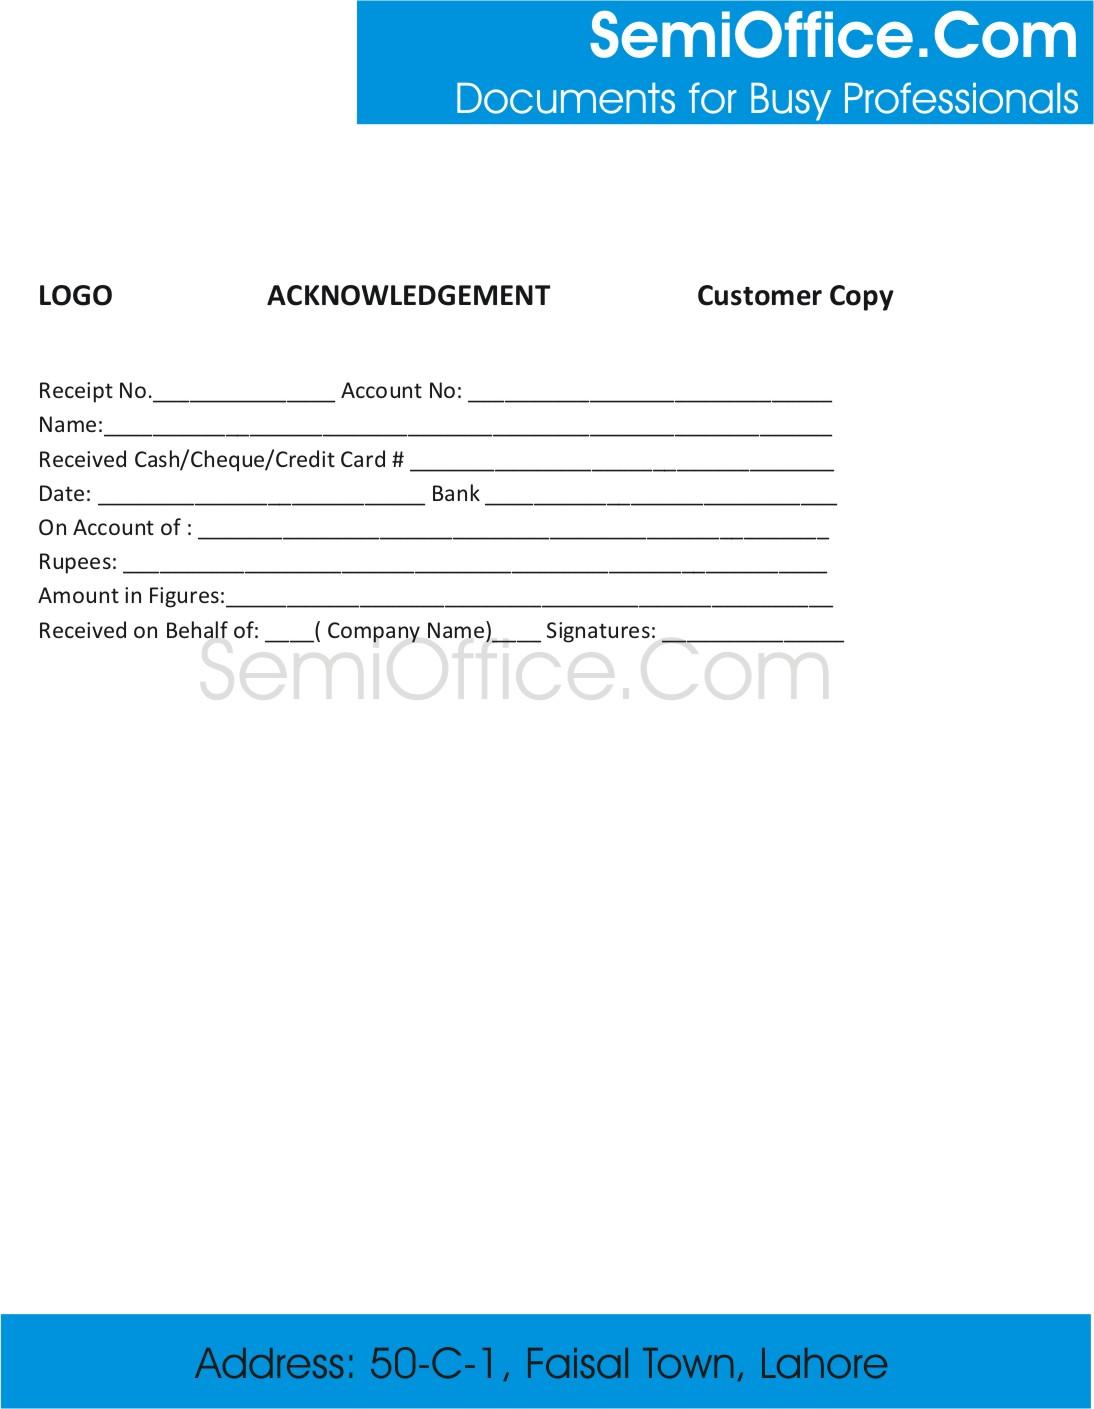 Sample acknowledgement receipt template acknowledgement receipt format altavistaventures Image collections